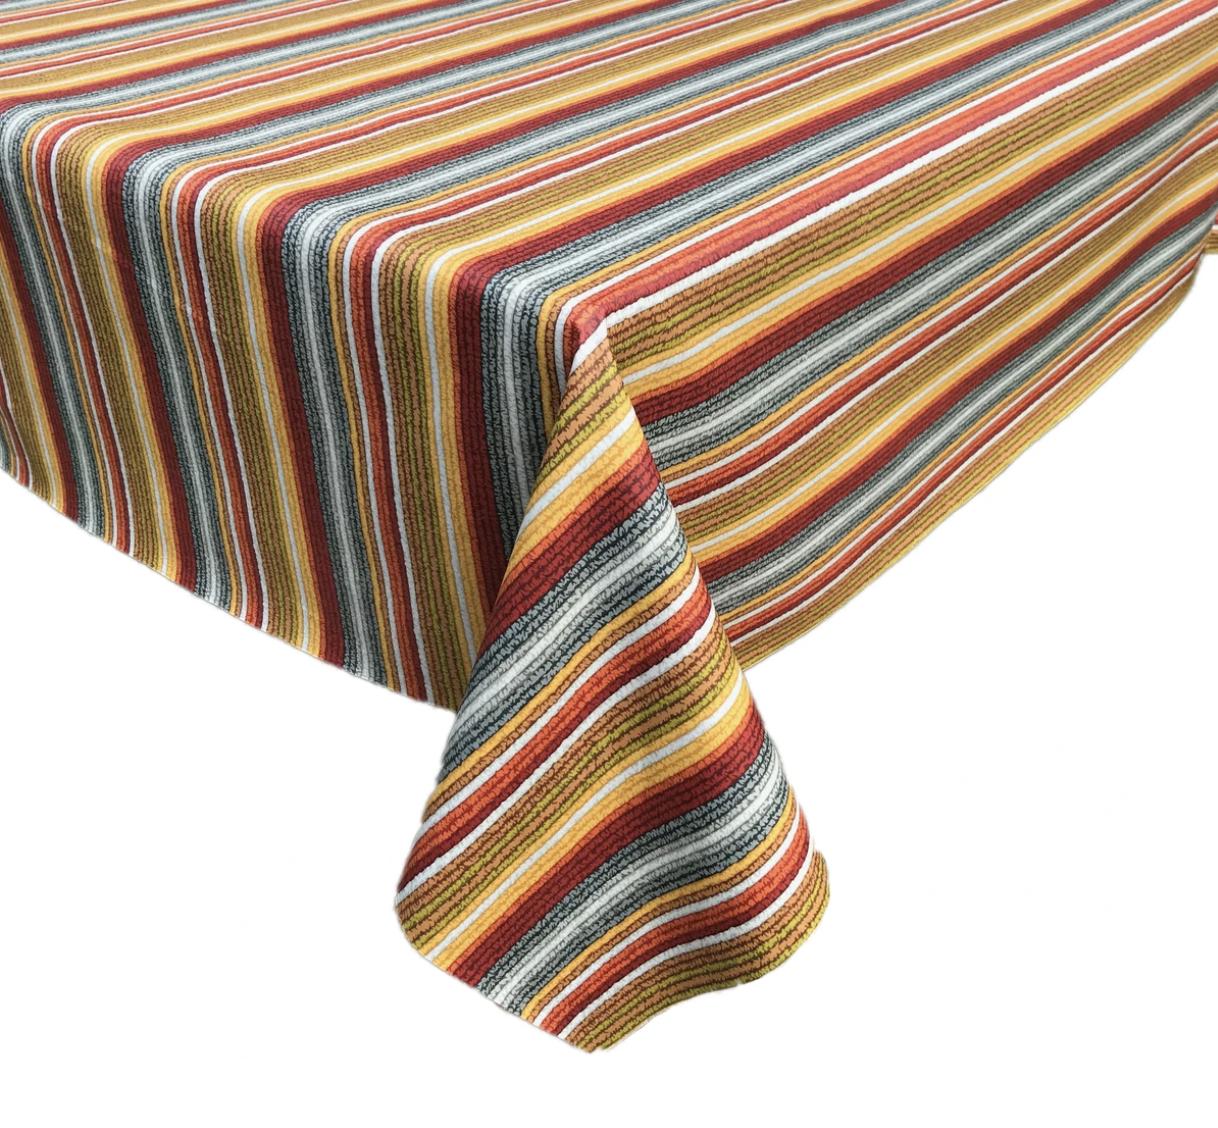 Splash Fabric Rectangular Oilcloth Tablecloth: Moab (Warm)